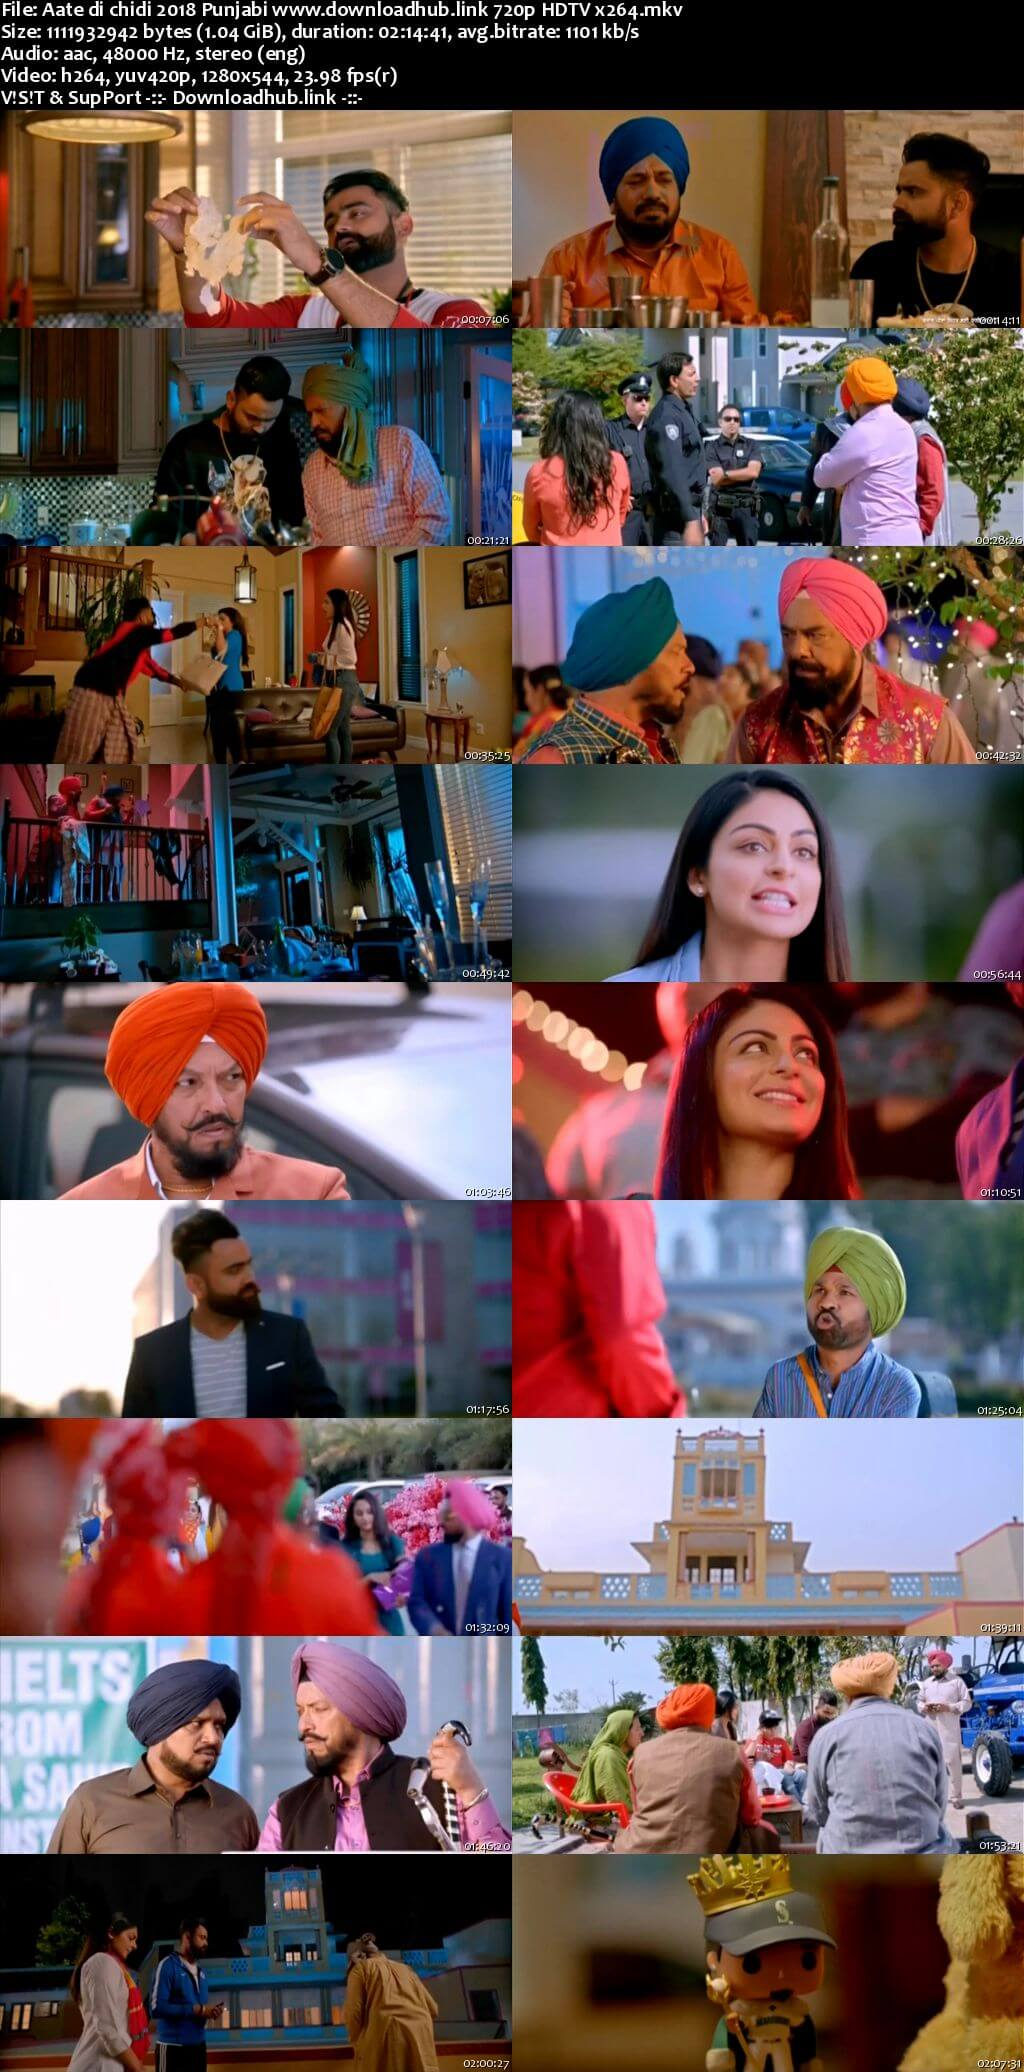 Aate di chidi 2018 Punjabi 720p HDTV x264